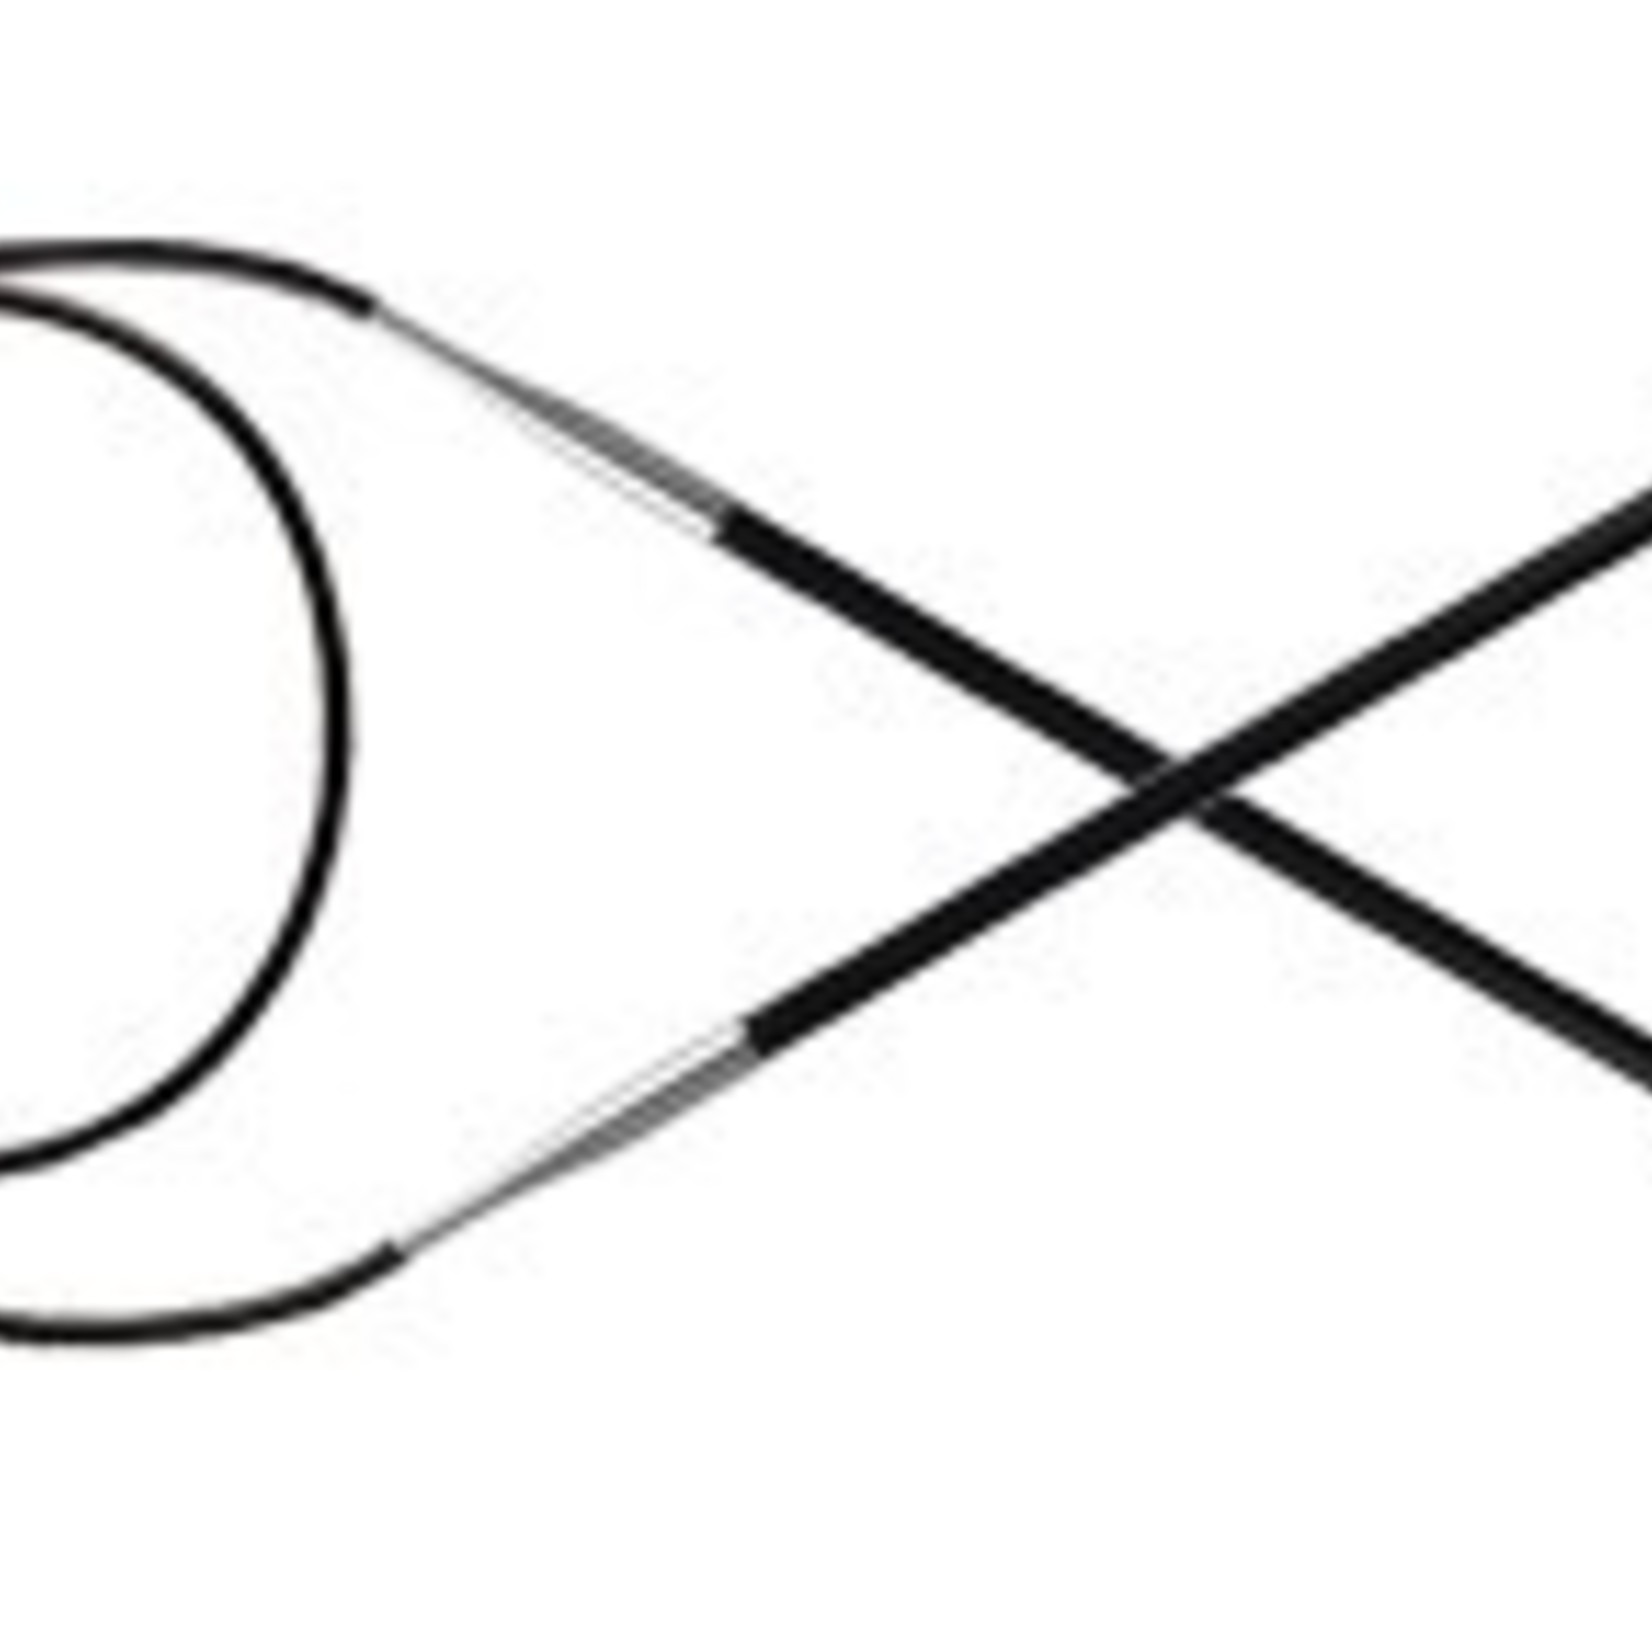 Knitter's Pride 8 Karbonz Circular 24